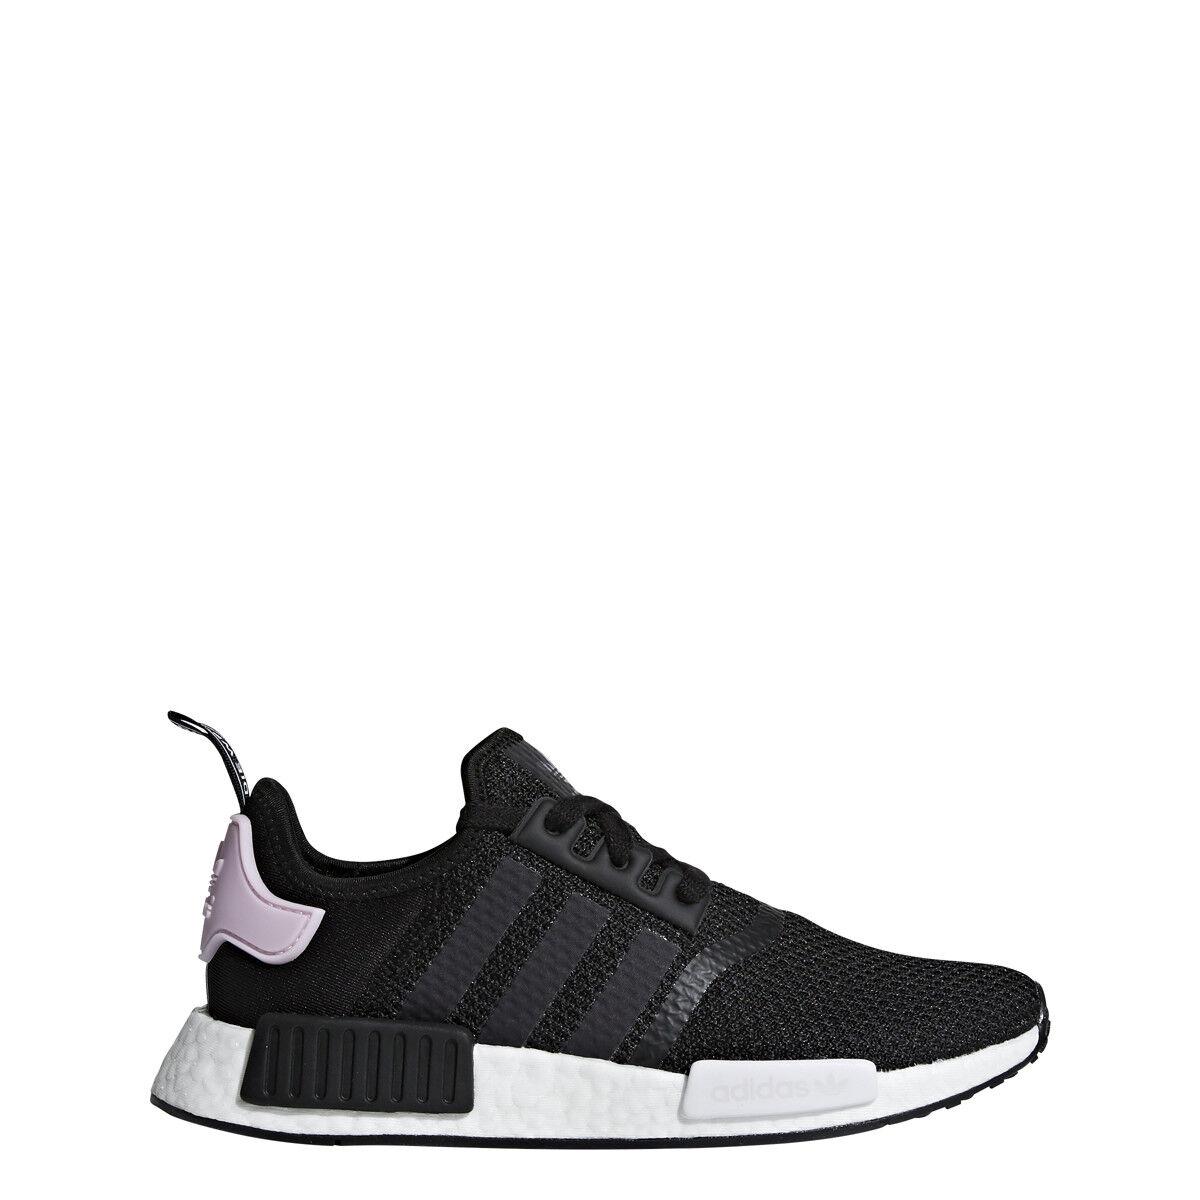 separation shoes c0883 a757a Adidas Mujer nmd r1 W Negro   blanco   rosa rosa rosa b37649 nuevos zapatos  para hombres